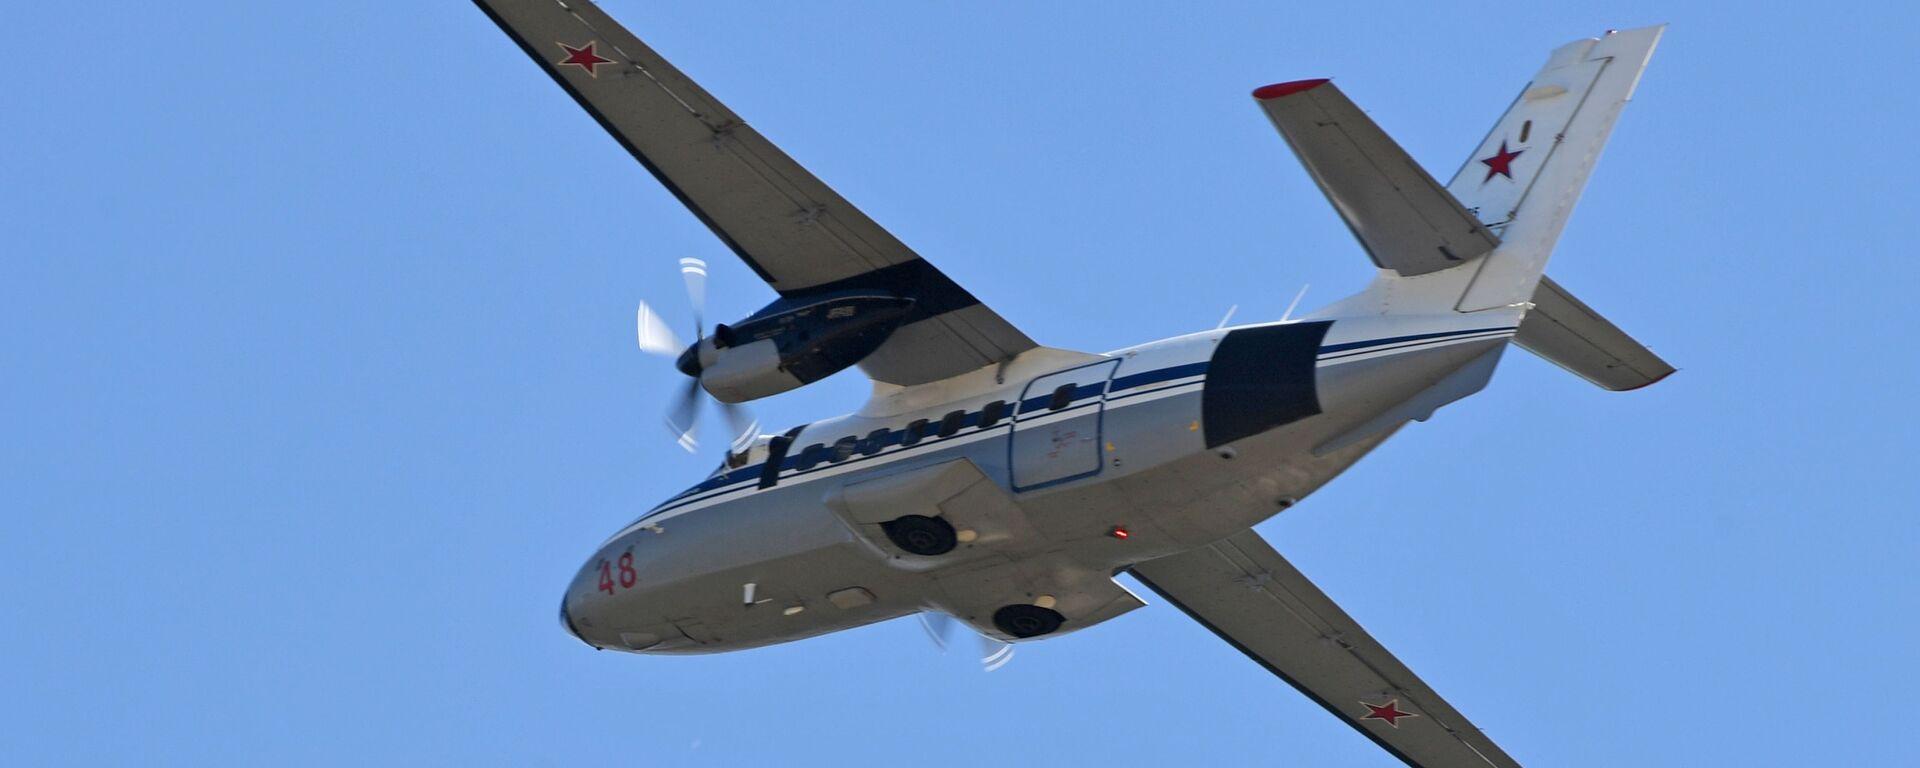 Samolot pasażerski L-410 - Sputnik Polska, 1920, 12.09.2021